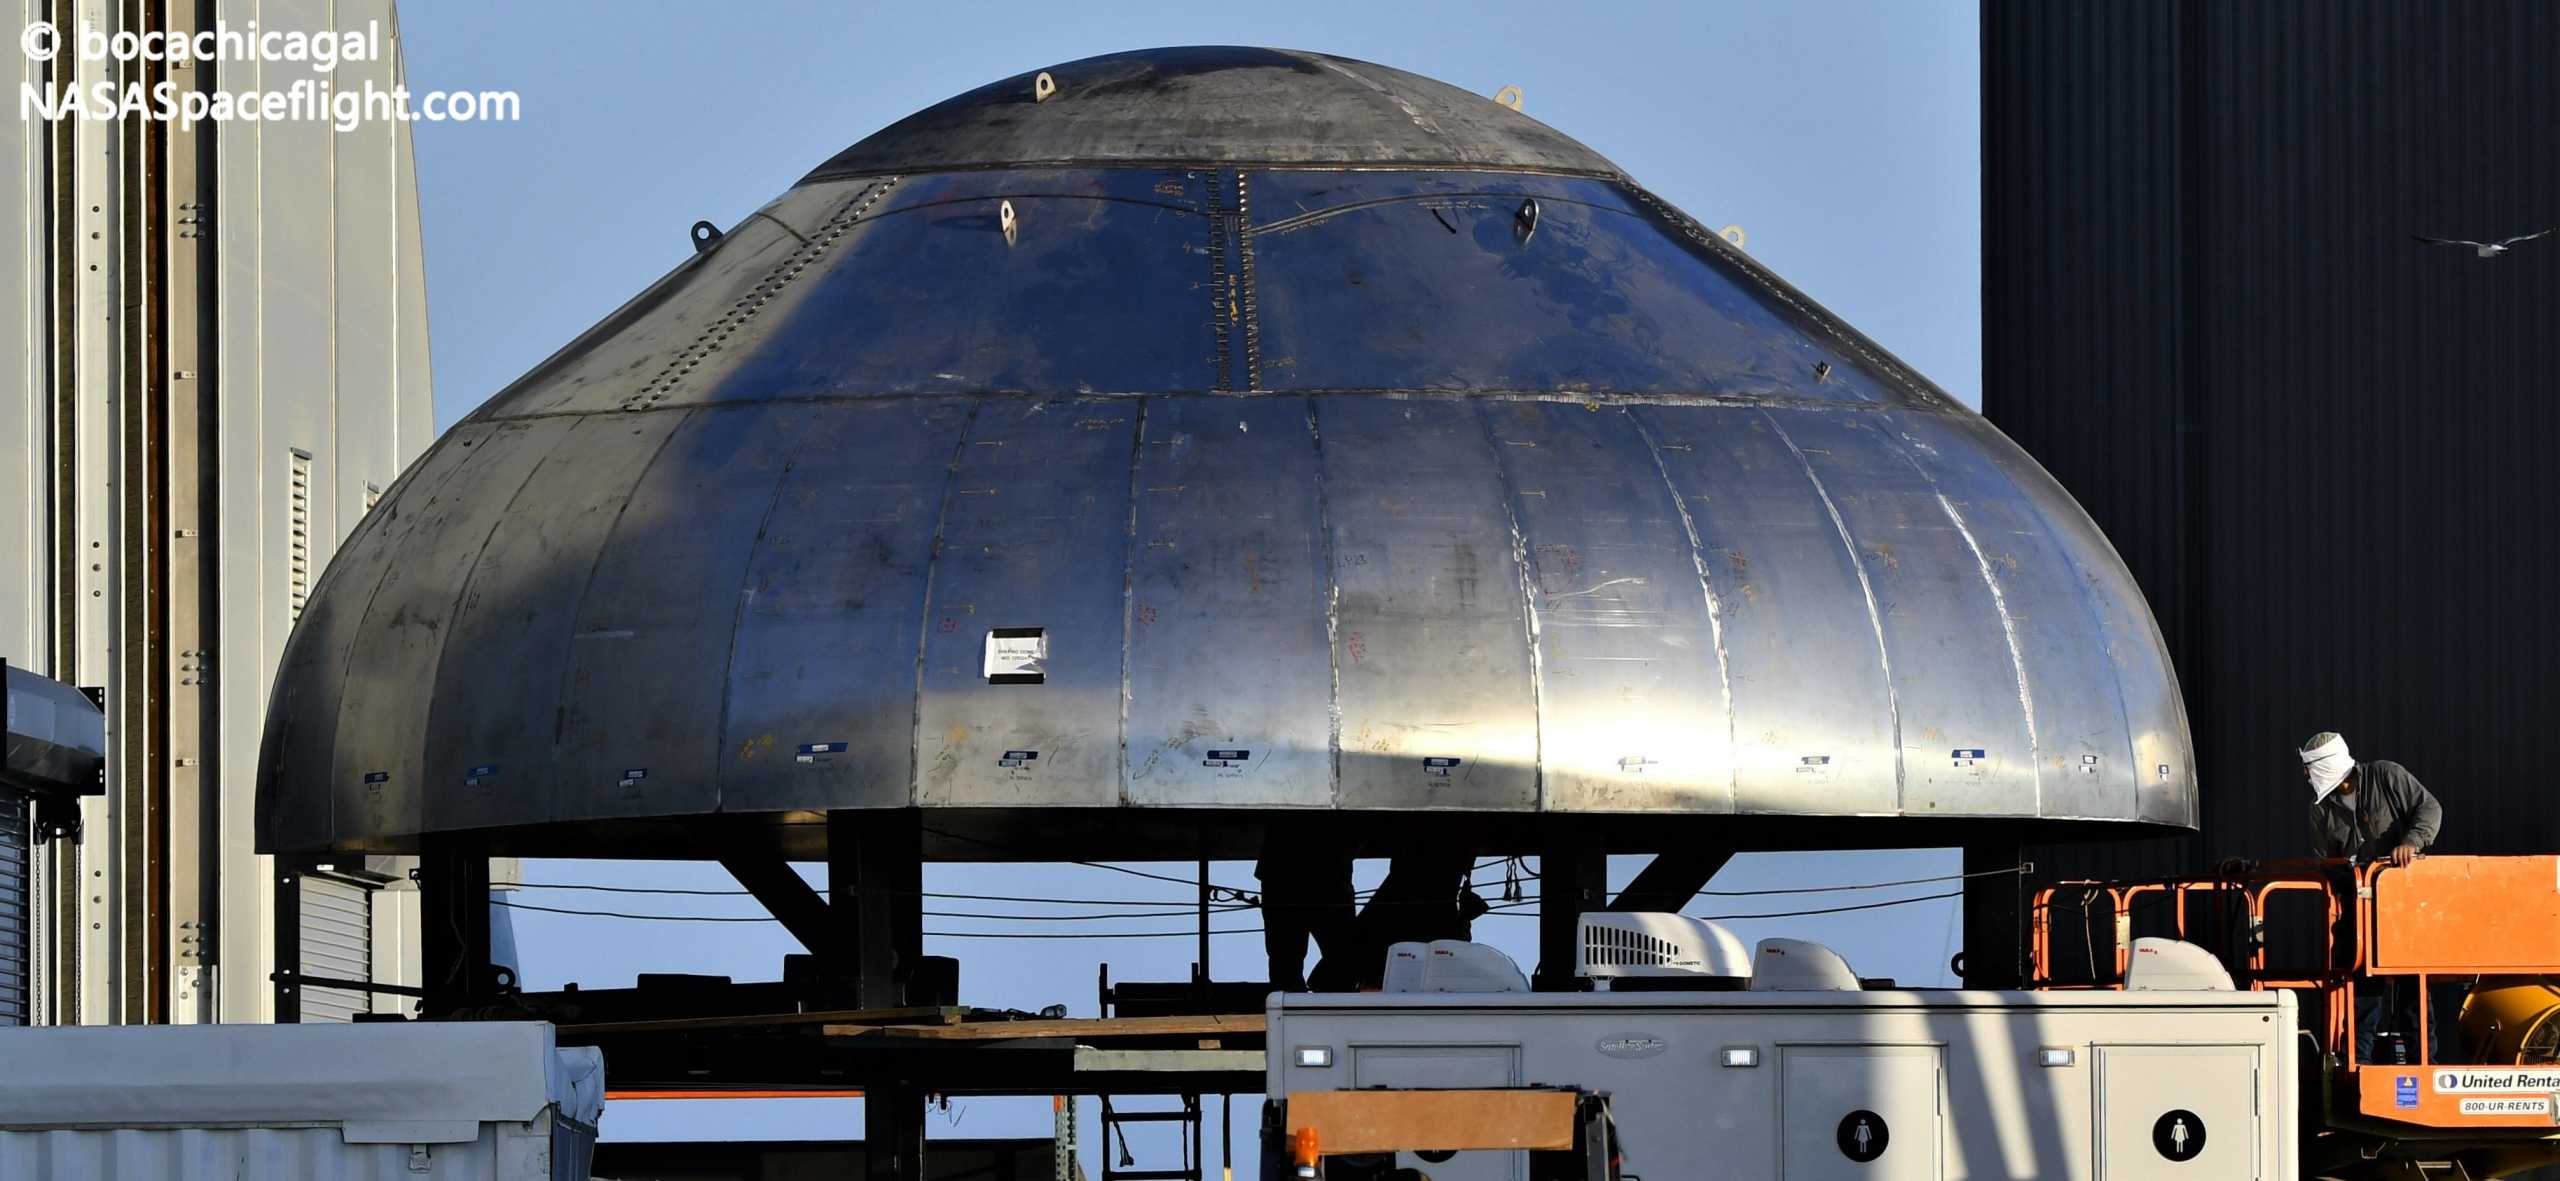 Starship Boca Chica 082020 (NASASpaceflight – bocachicagal) SN9 forward dome 2 crop (c)